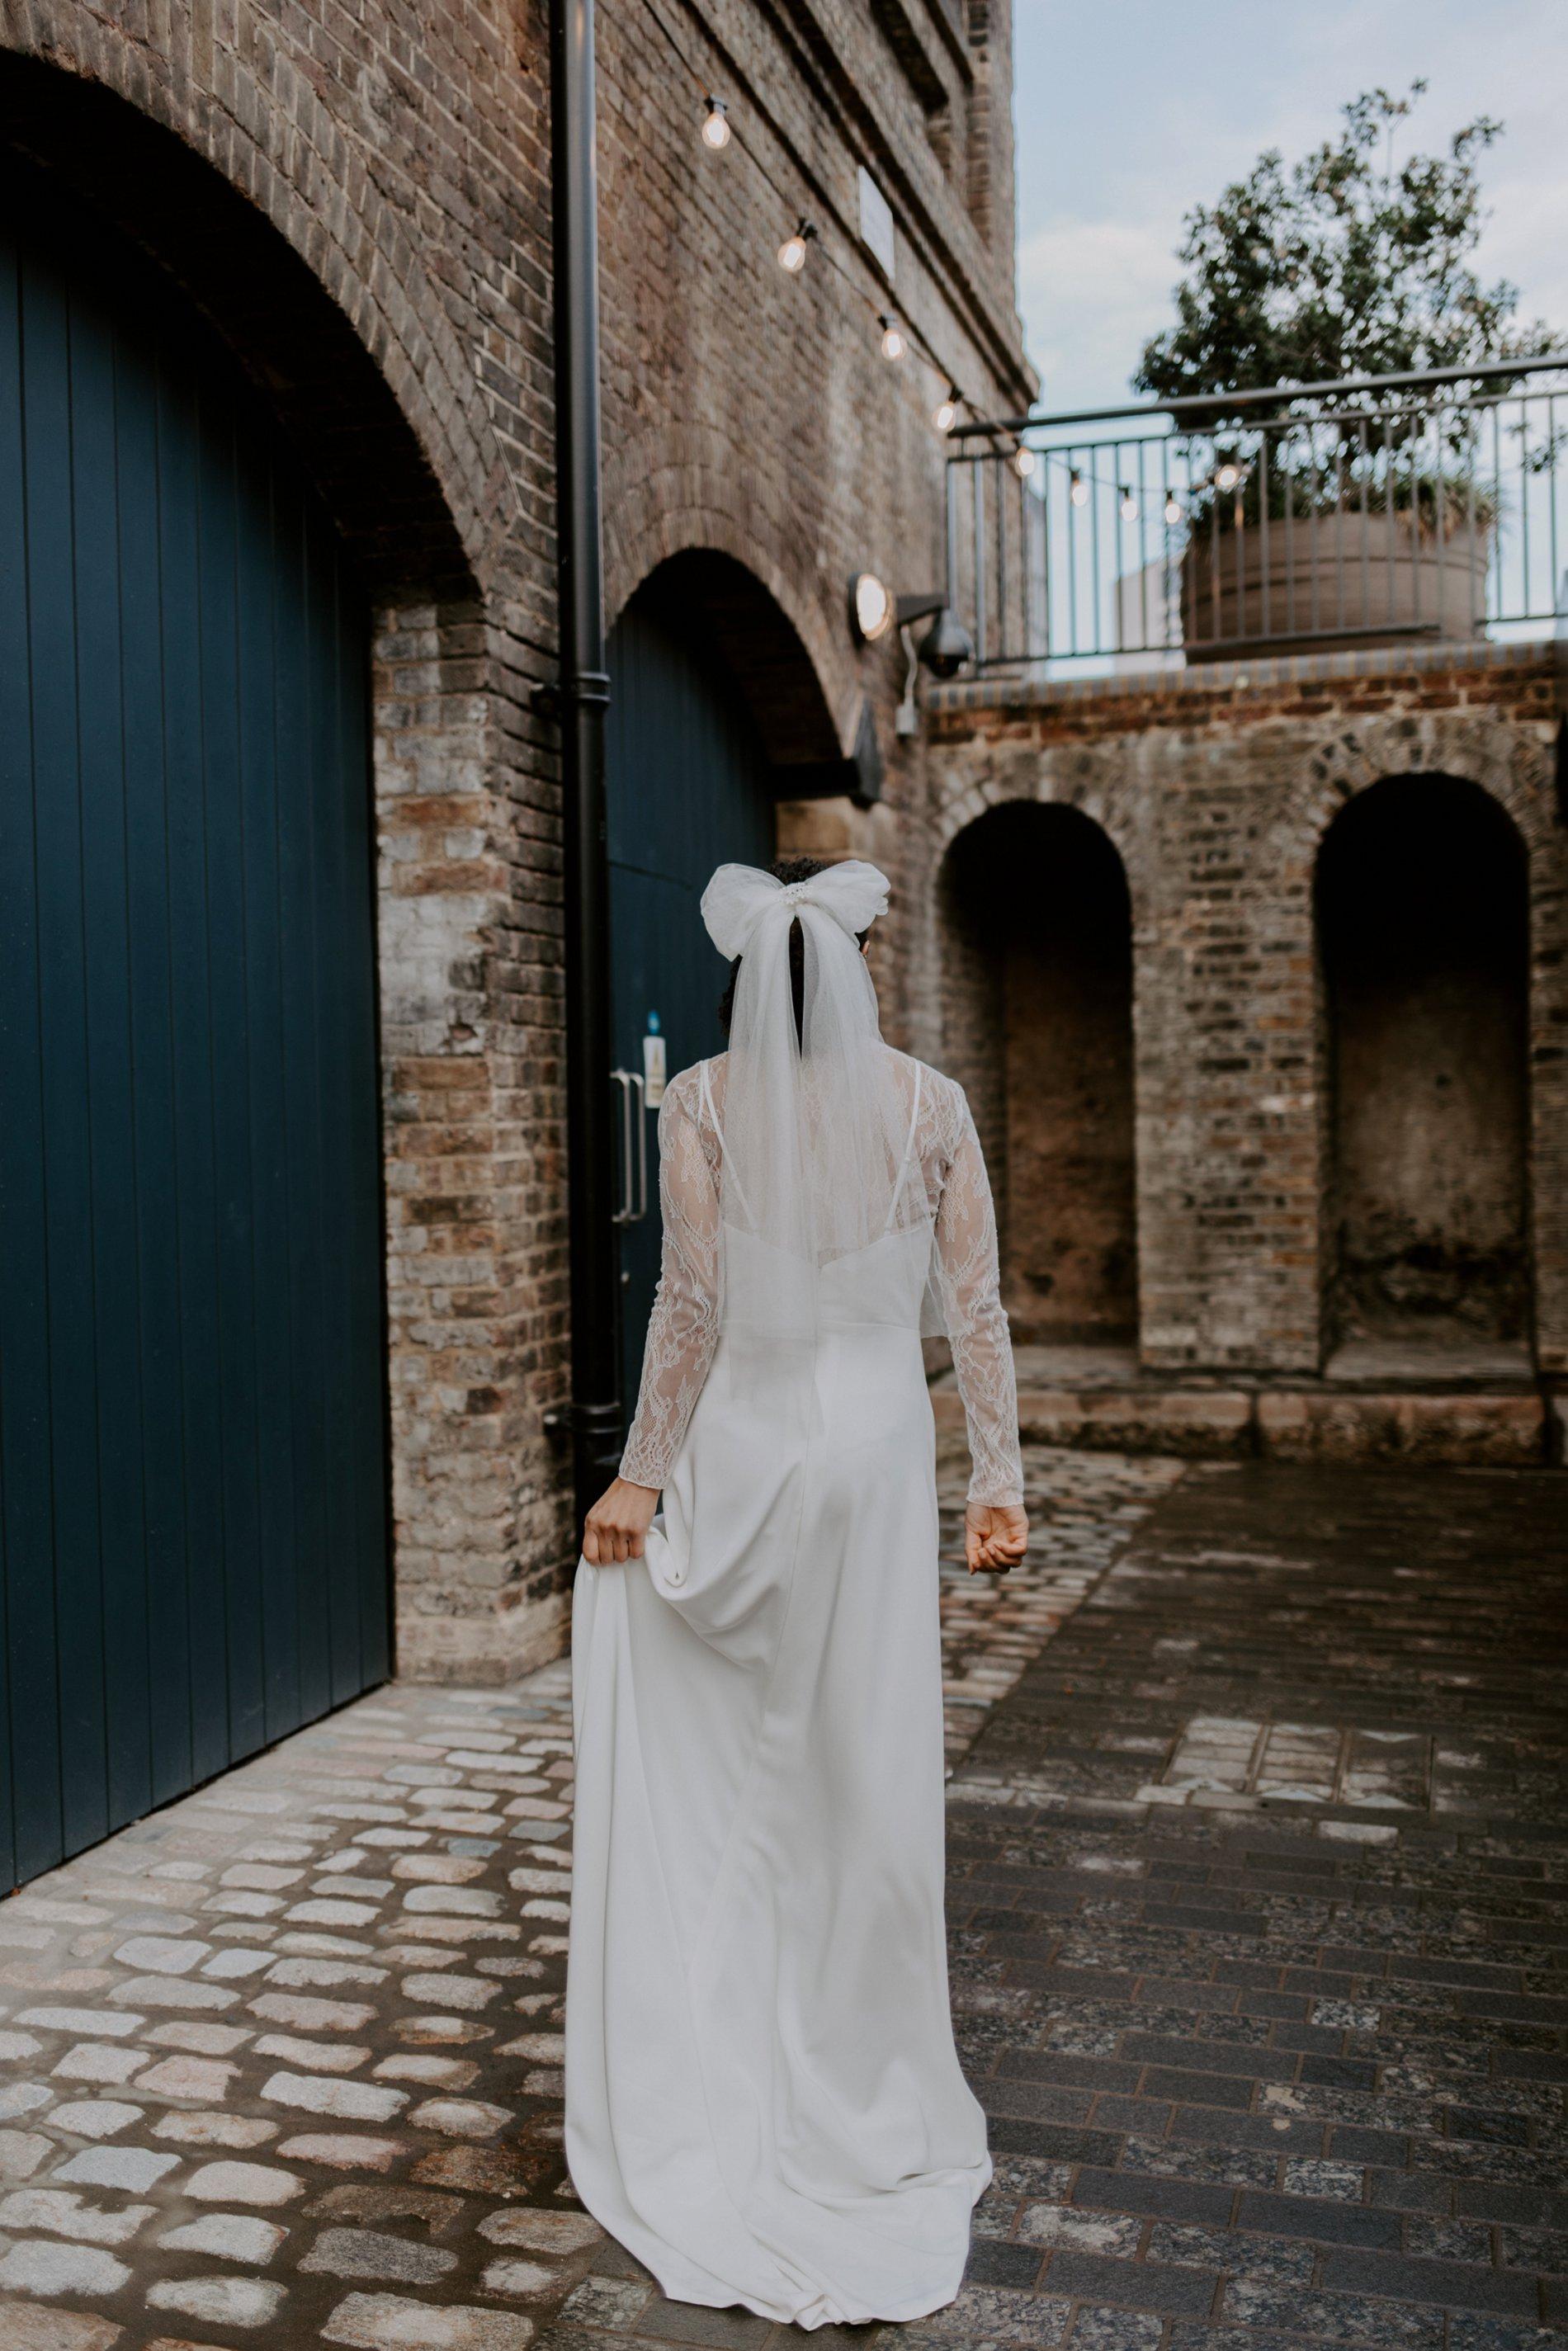 City Wedding Styled Shoot at Coal Drops Yard (c) Emztography (16)